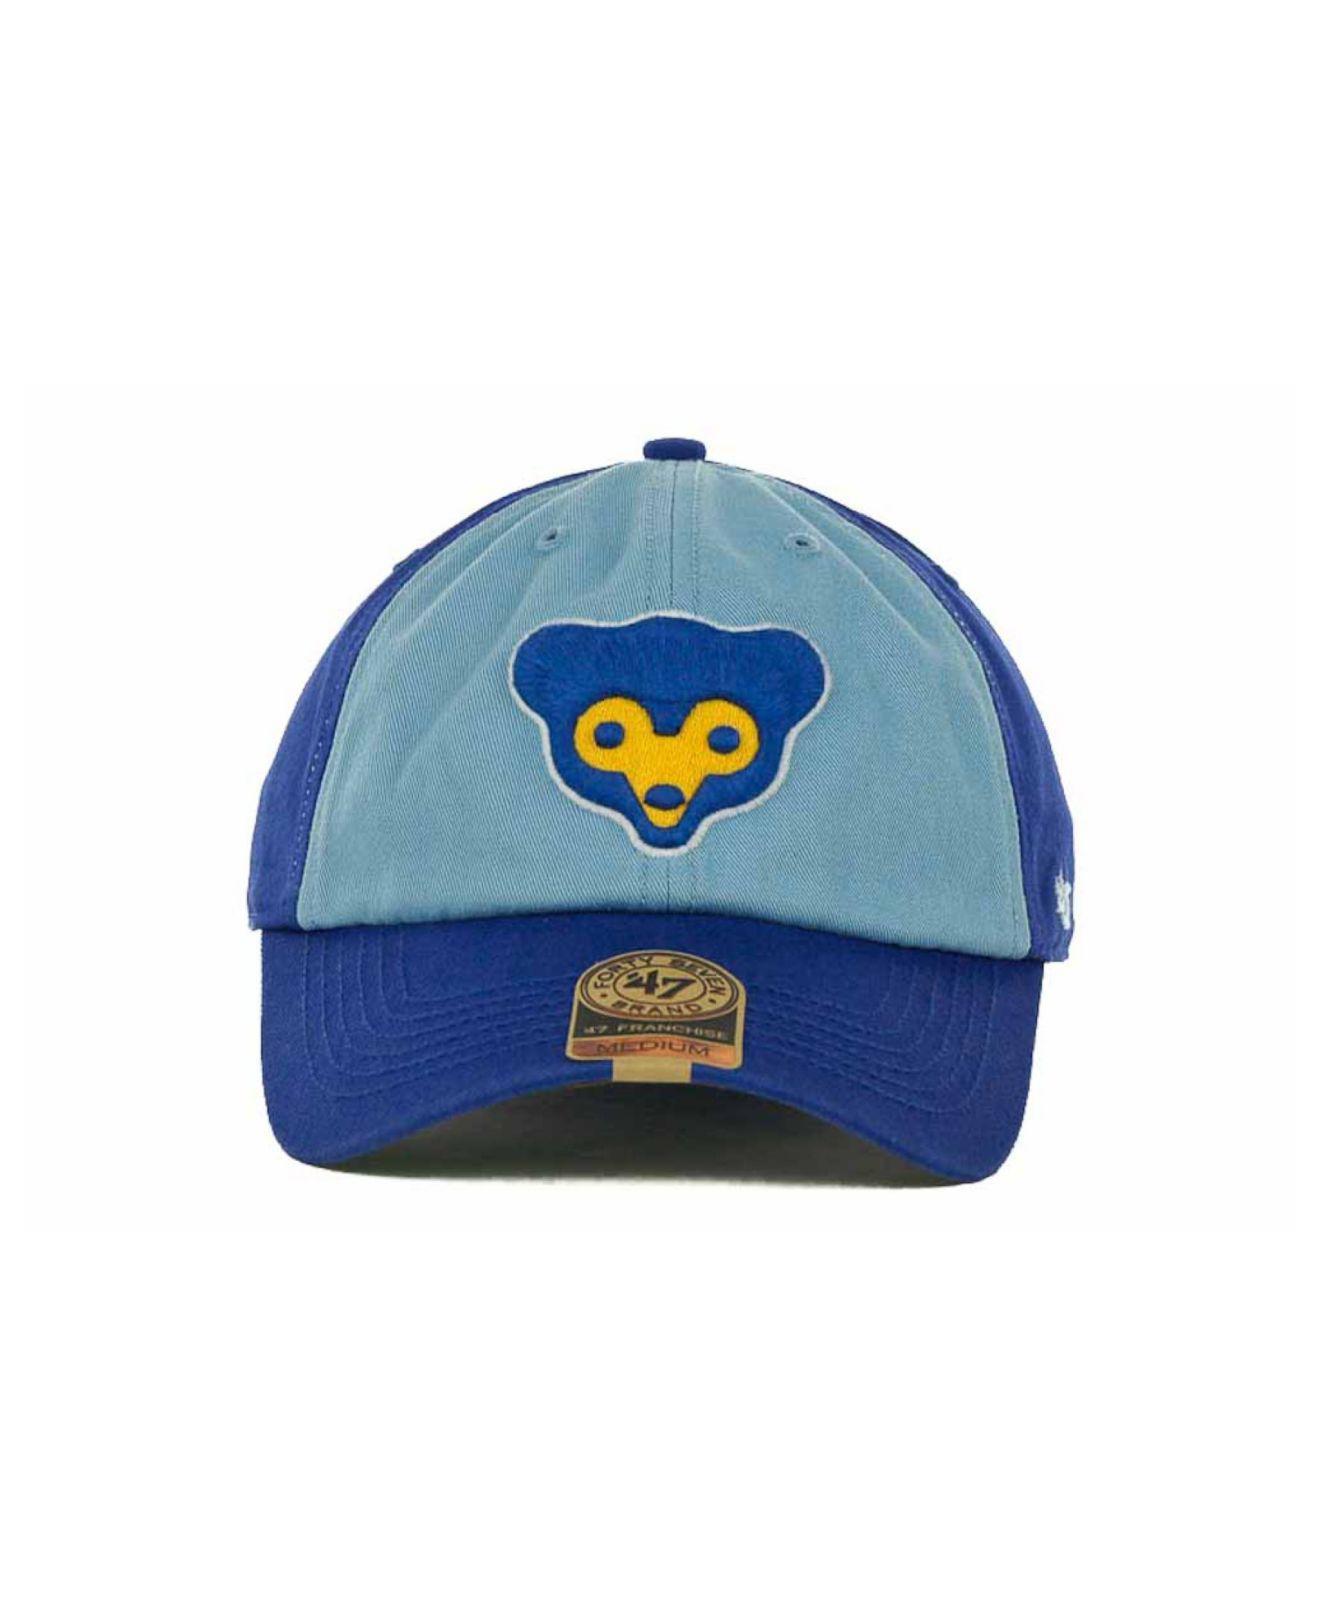 buy popular 87075 962fe ... coupon code for lyst 47 brand chicago cubs mlb 47 franchise cap in  green for men